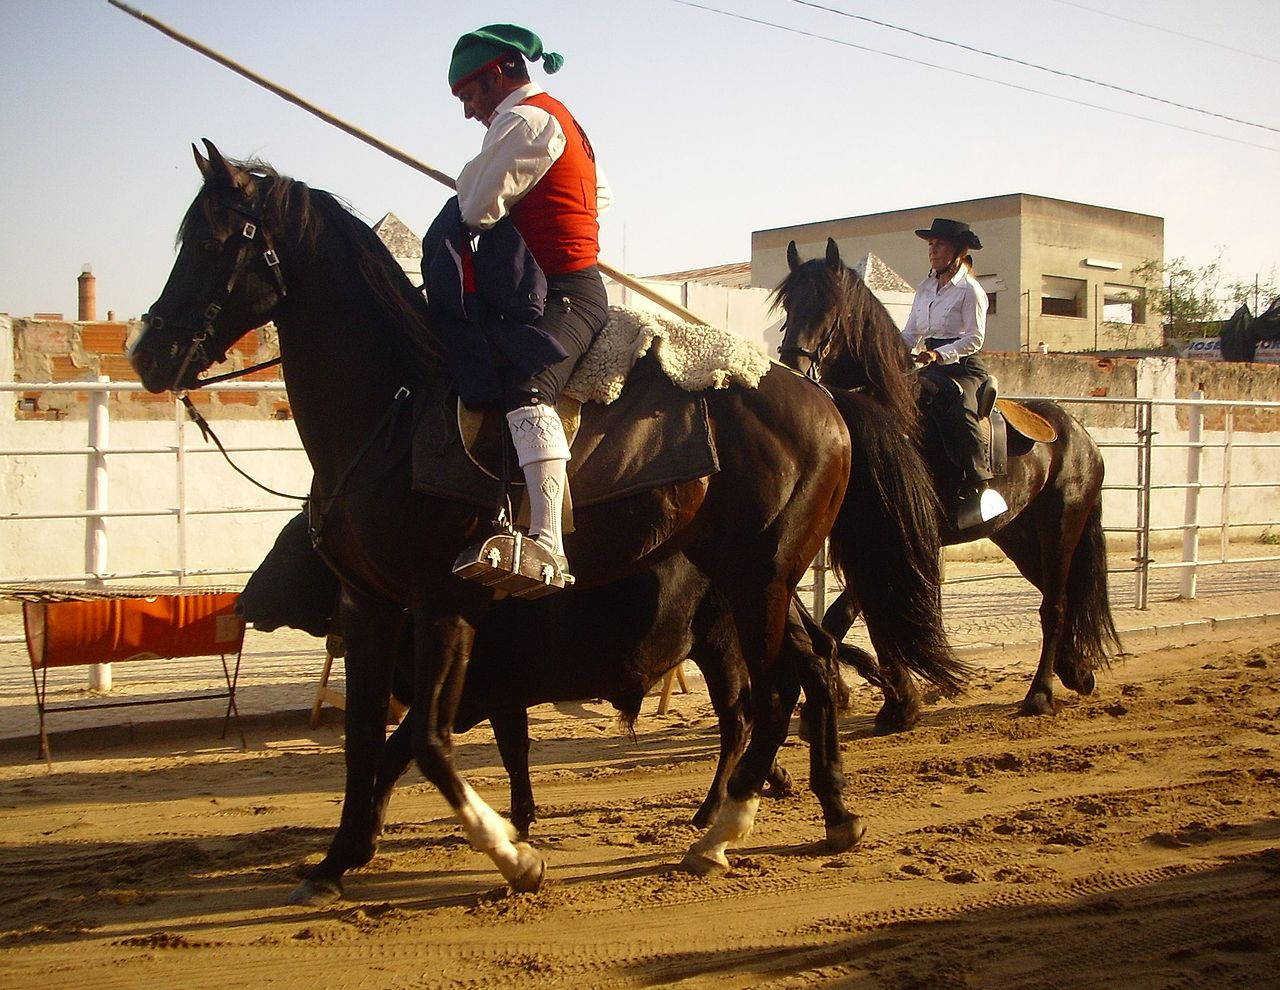 A campino on horseback